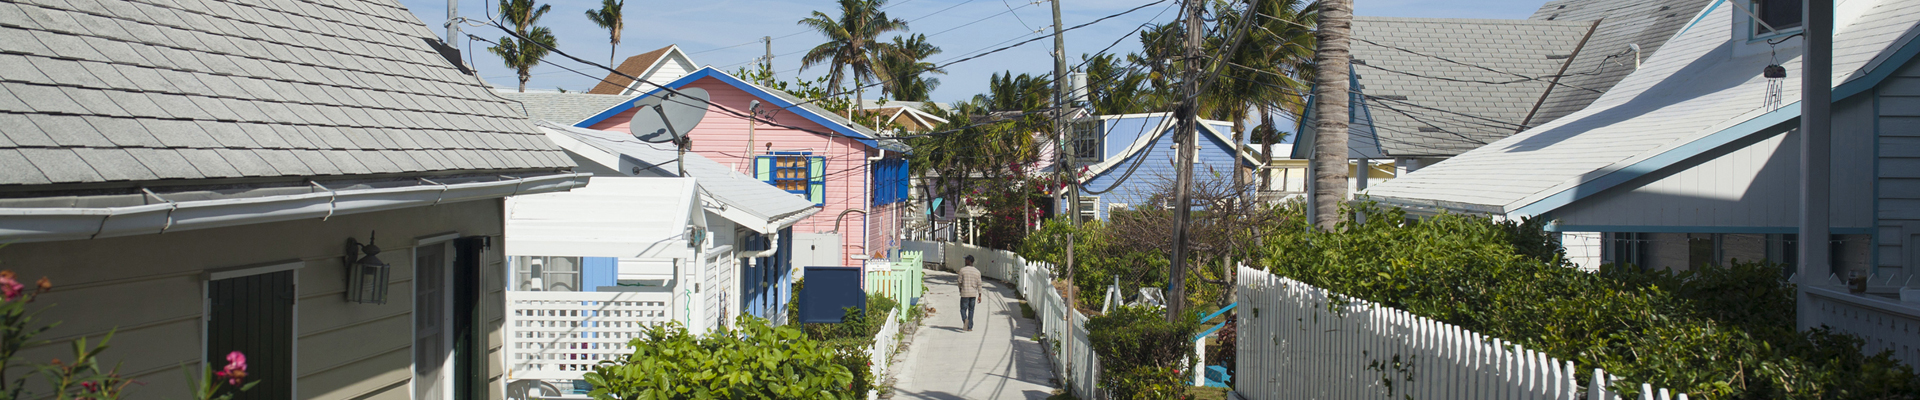 Hopetown in Elbow Cay, Bahamas